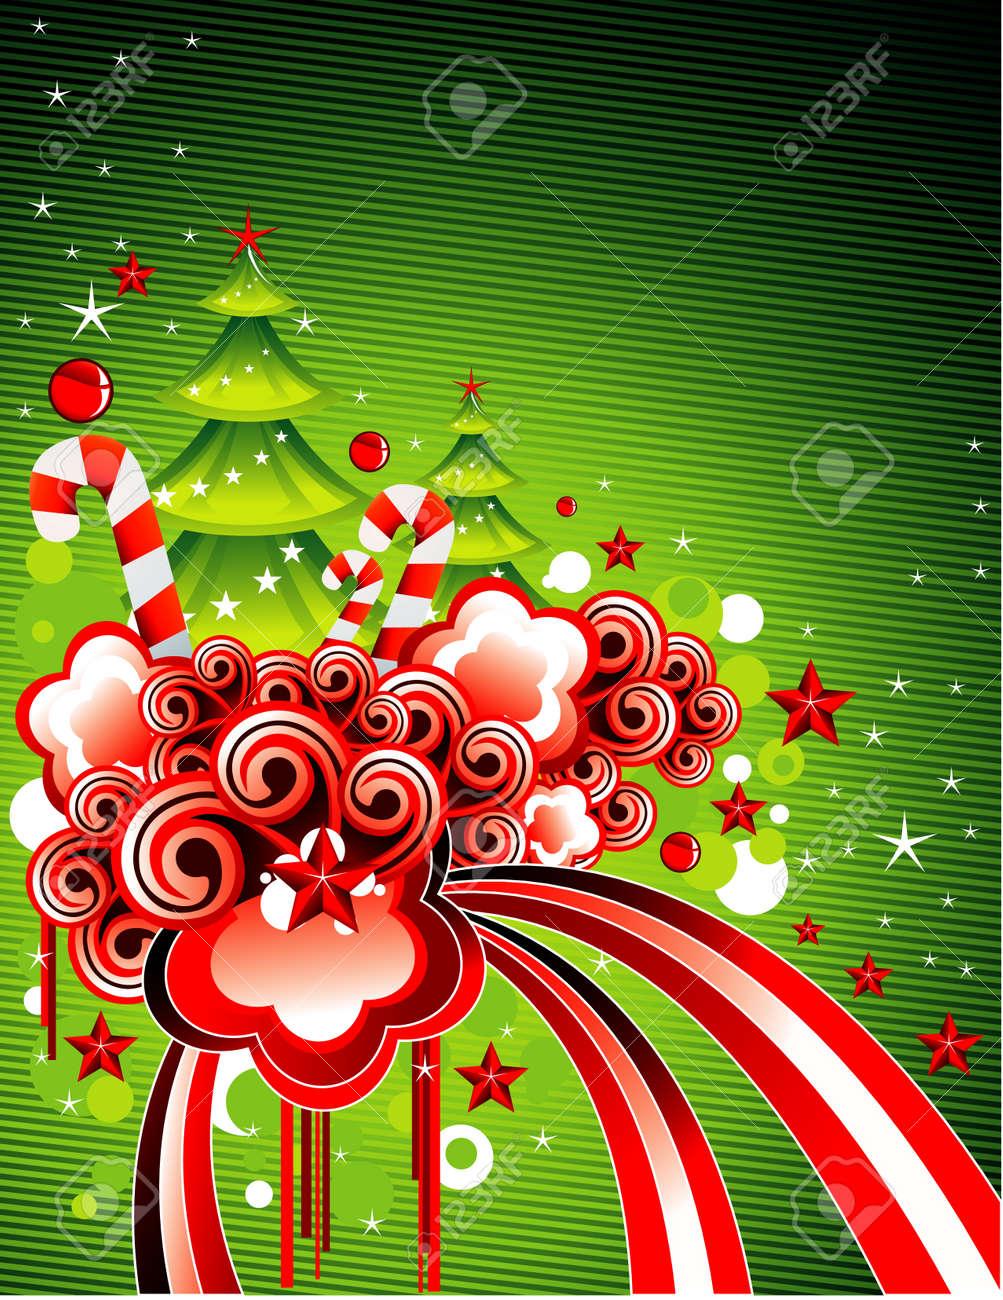 Vector illustration of fantasy shapes for christmas celebration Stock Vector - 3796241